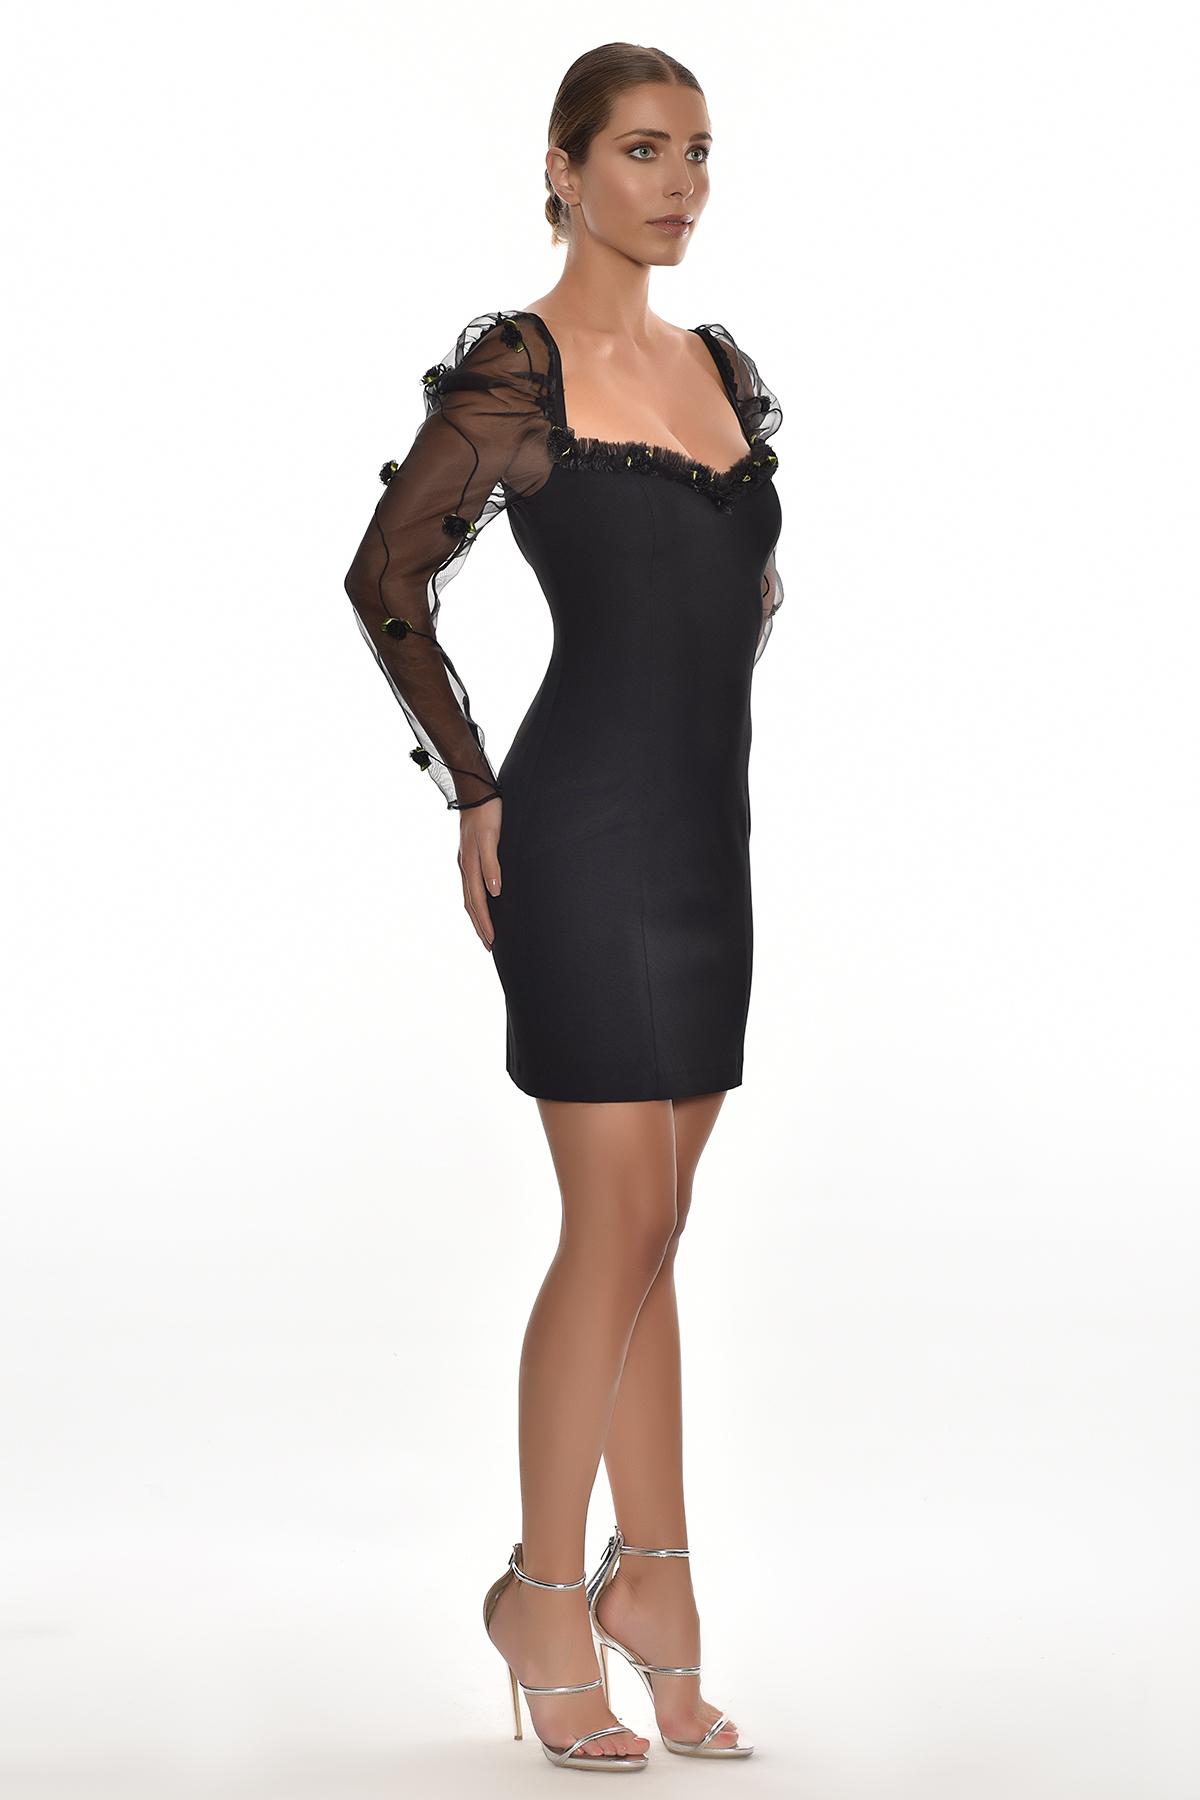 Siyah Uzun Tül Kollu Jarse Kısa Elbise - Thumbnail